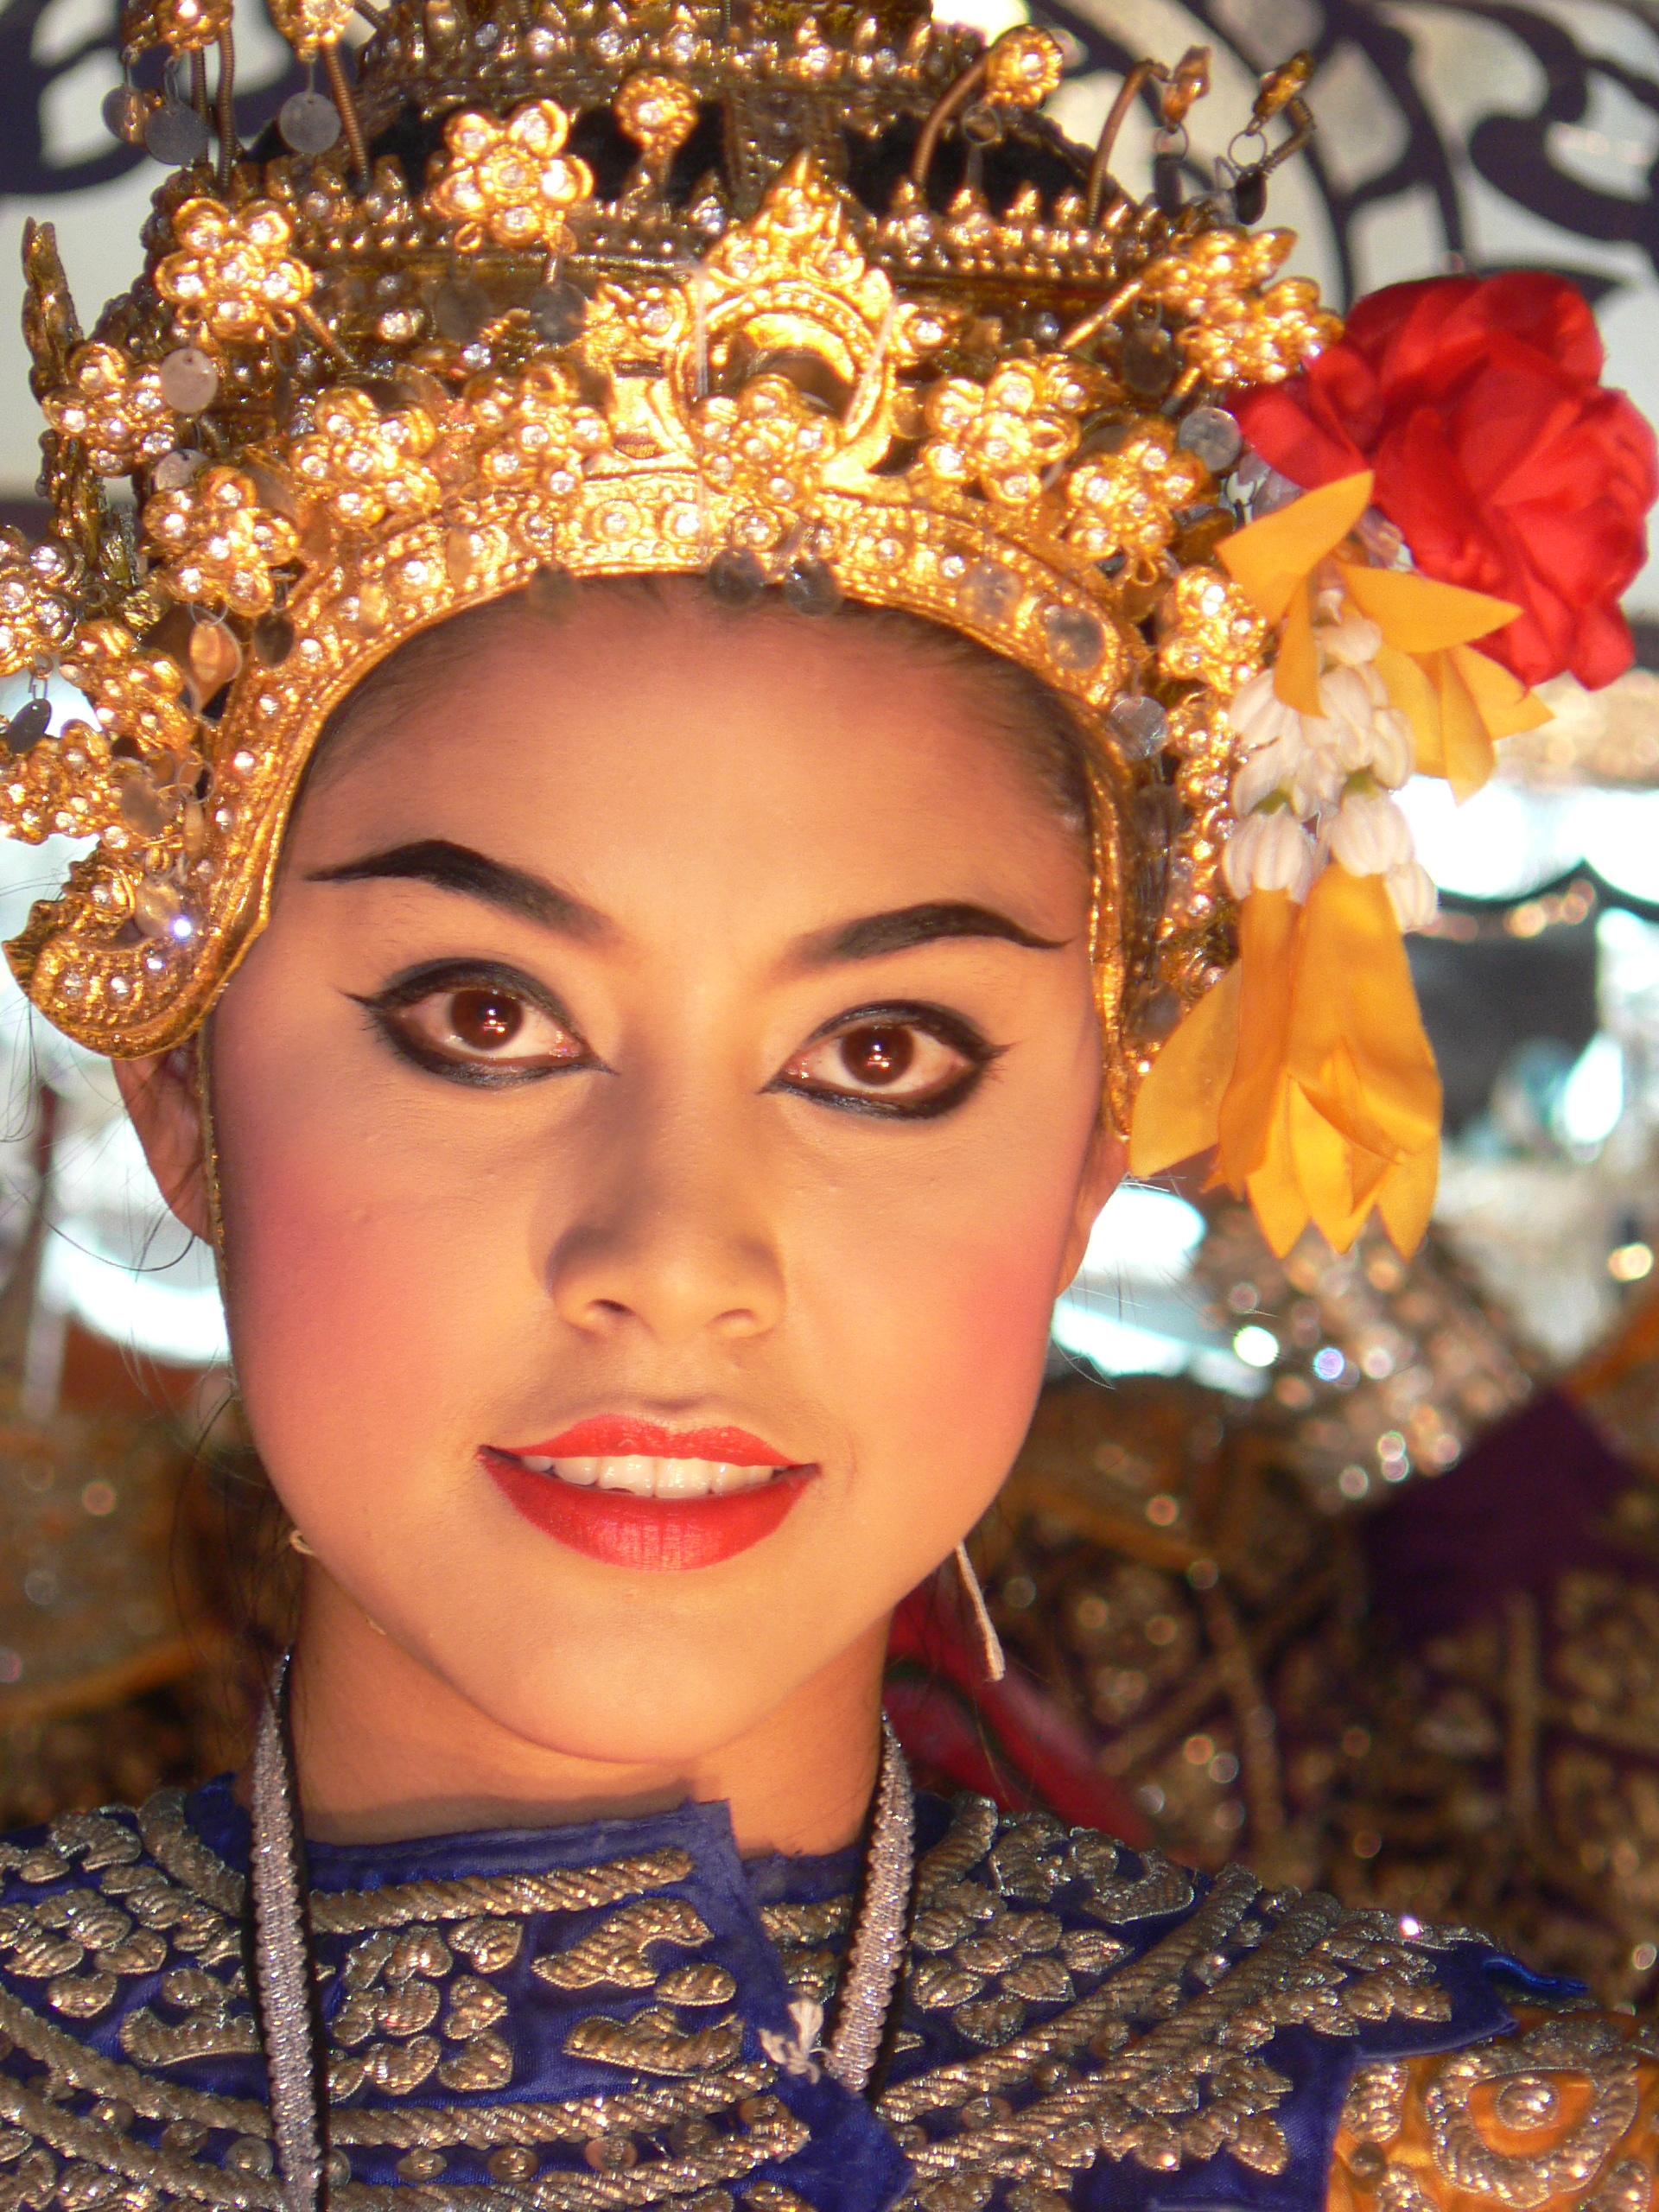 File:Thai traditional headdress Chiang Mai 2005 035.jpg ...